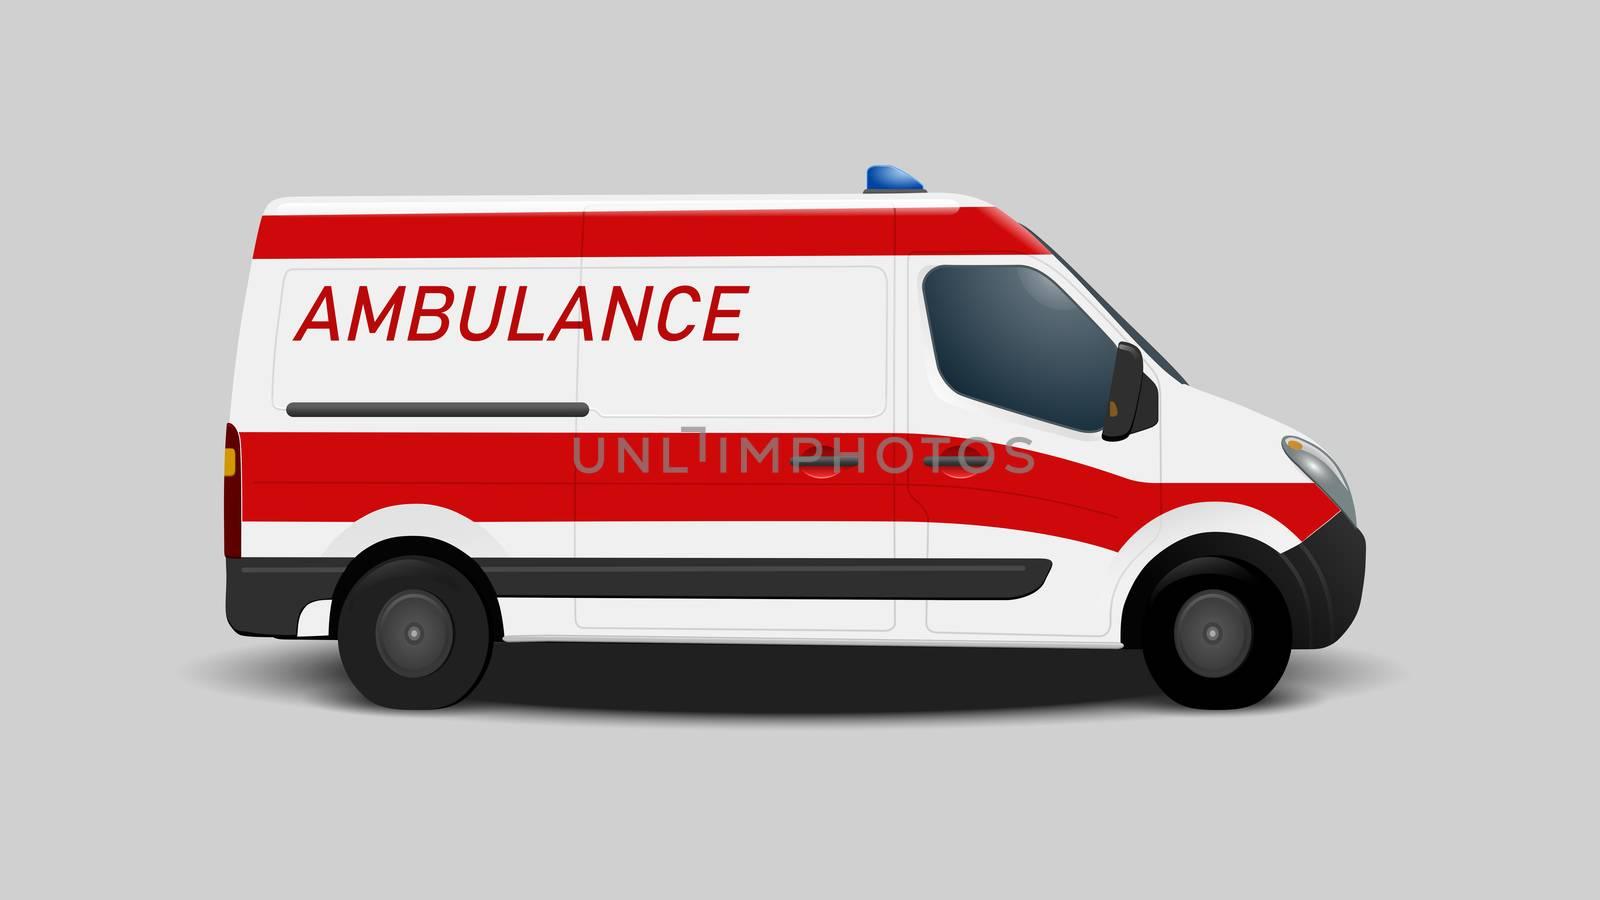 An illustration of a typical ambulance car transportation aid